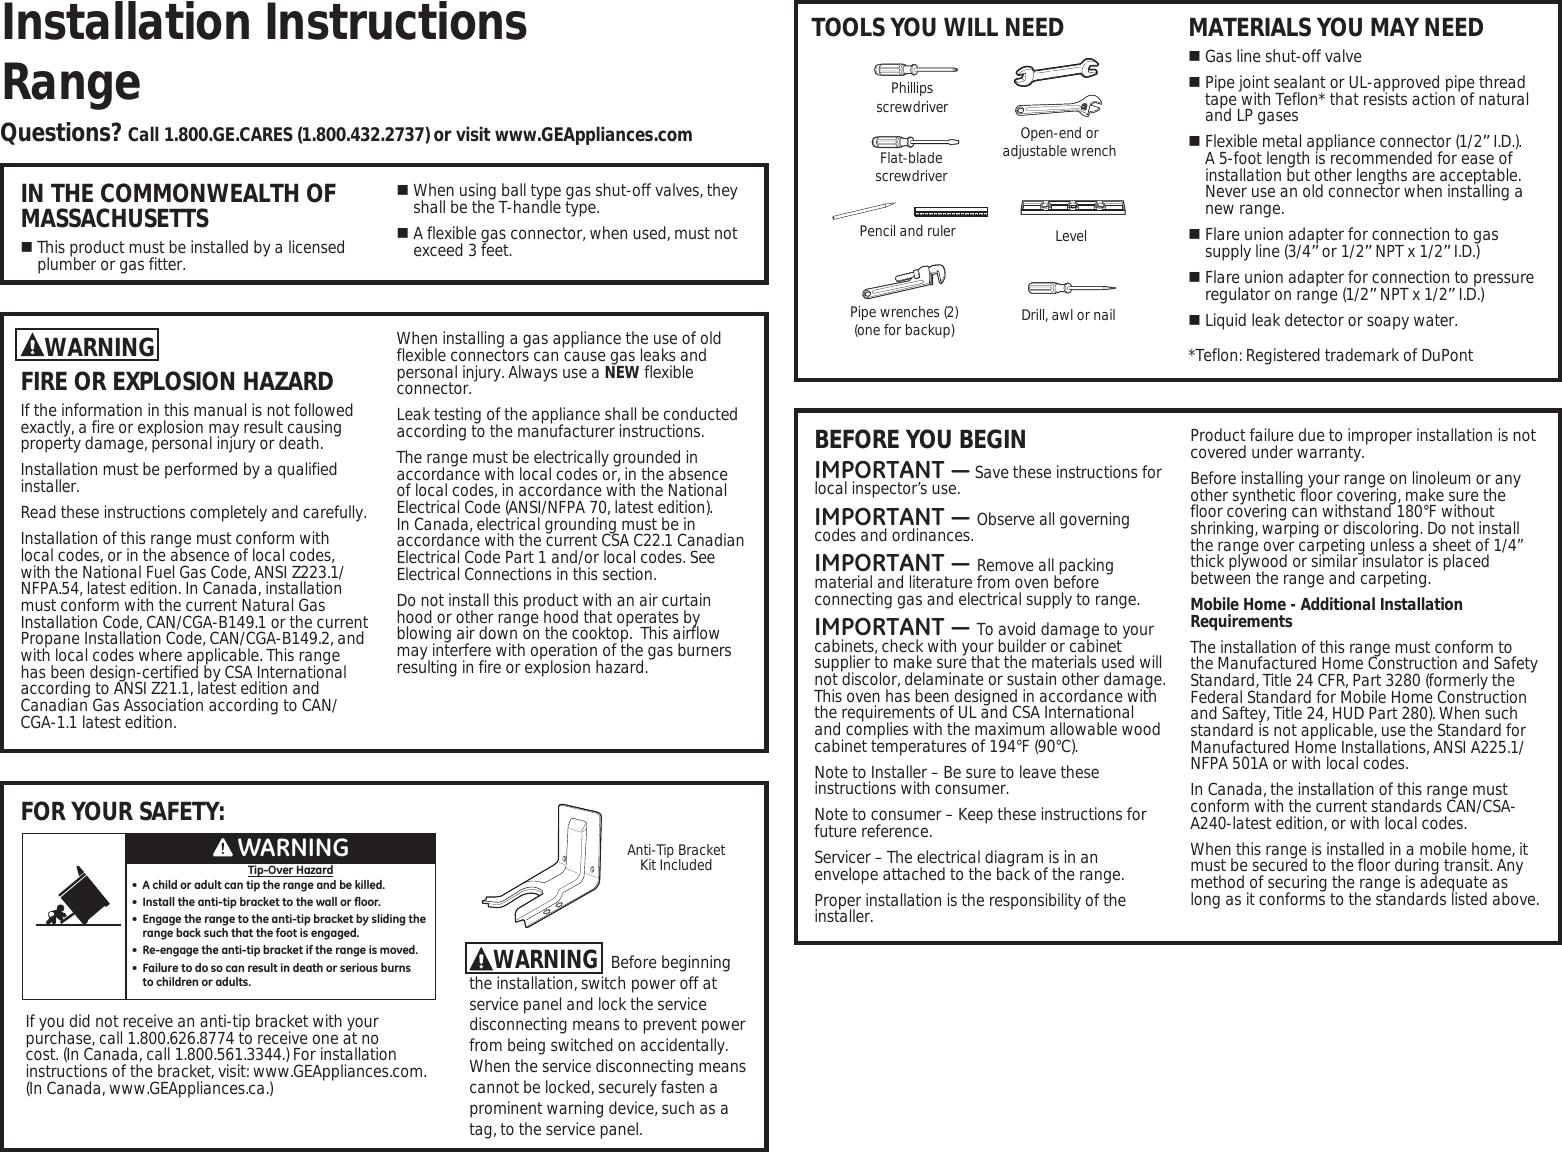 ge jgbs60dek2bb user manual gas range manuals and guides 1708684l rh usermanual wiki Pneumatic Screwdriver Torque Wrench Screwdriver